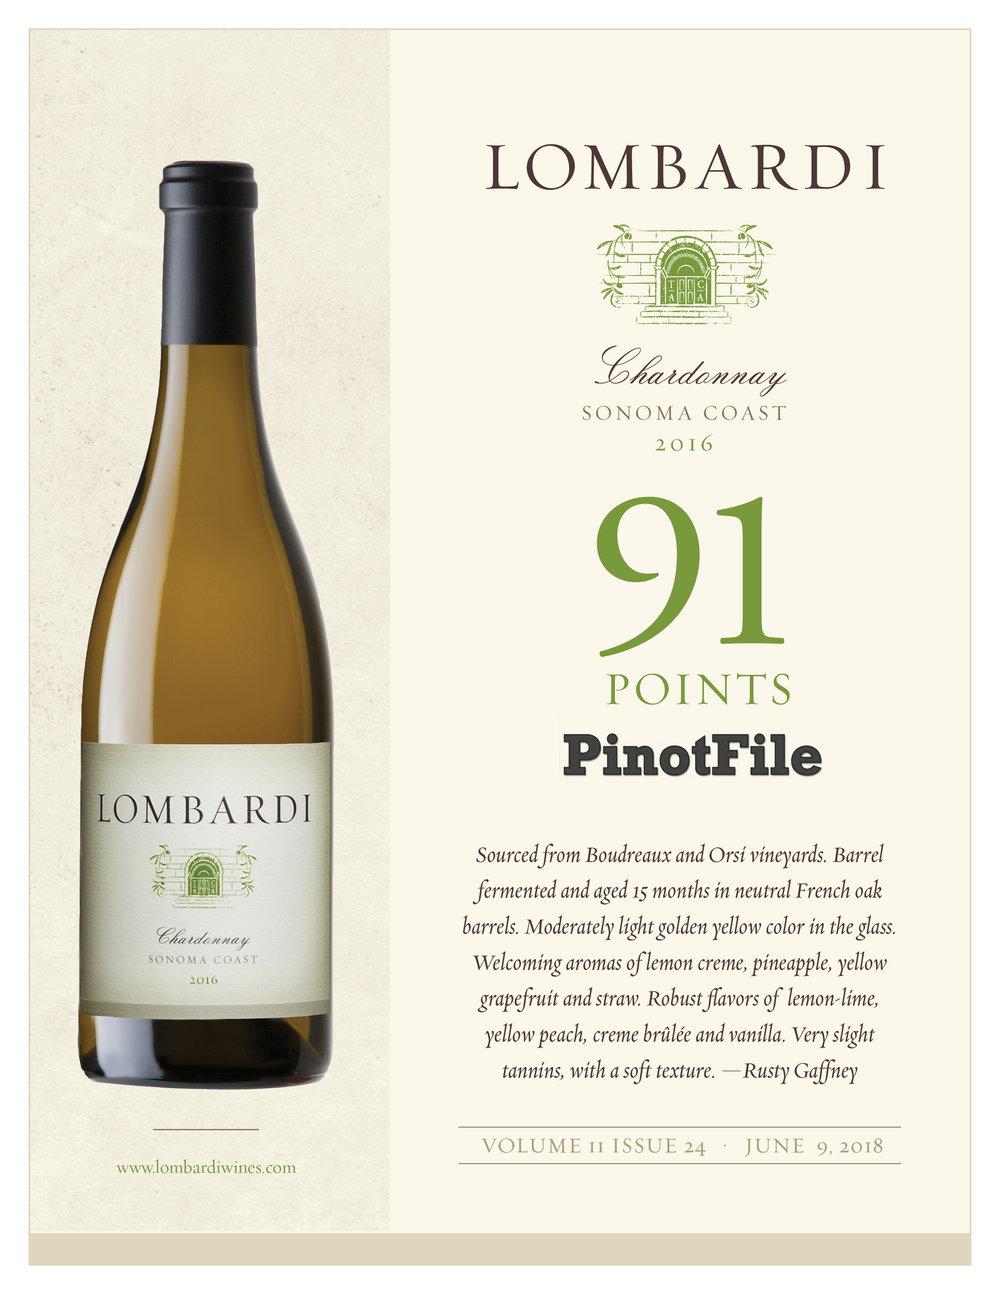 Lombardi_Chardonnay2016_PinotFile_June2018.jpg